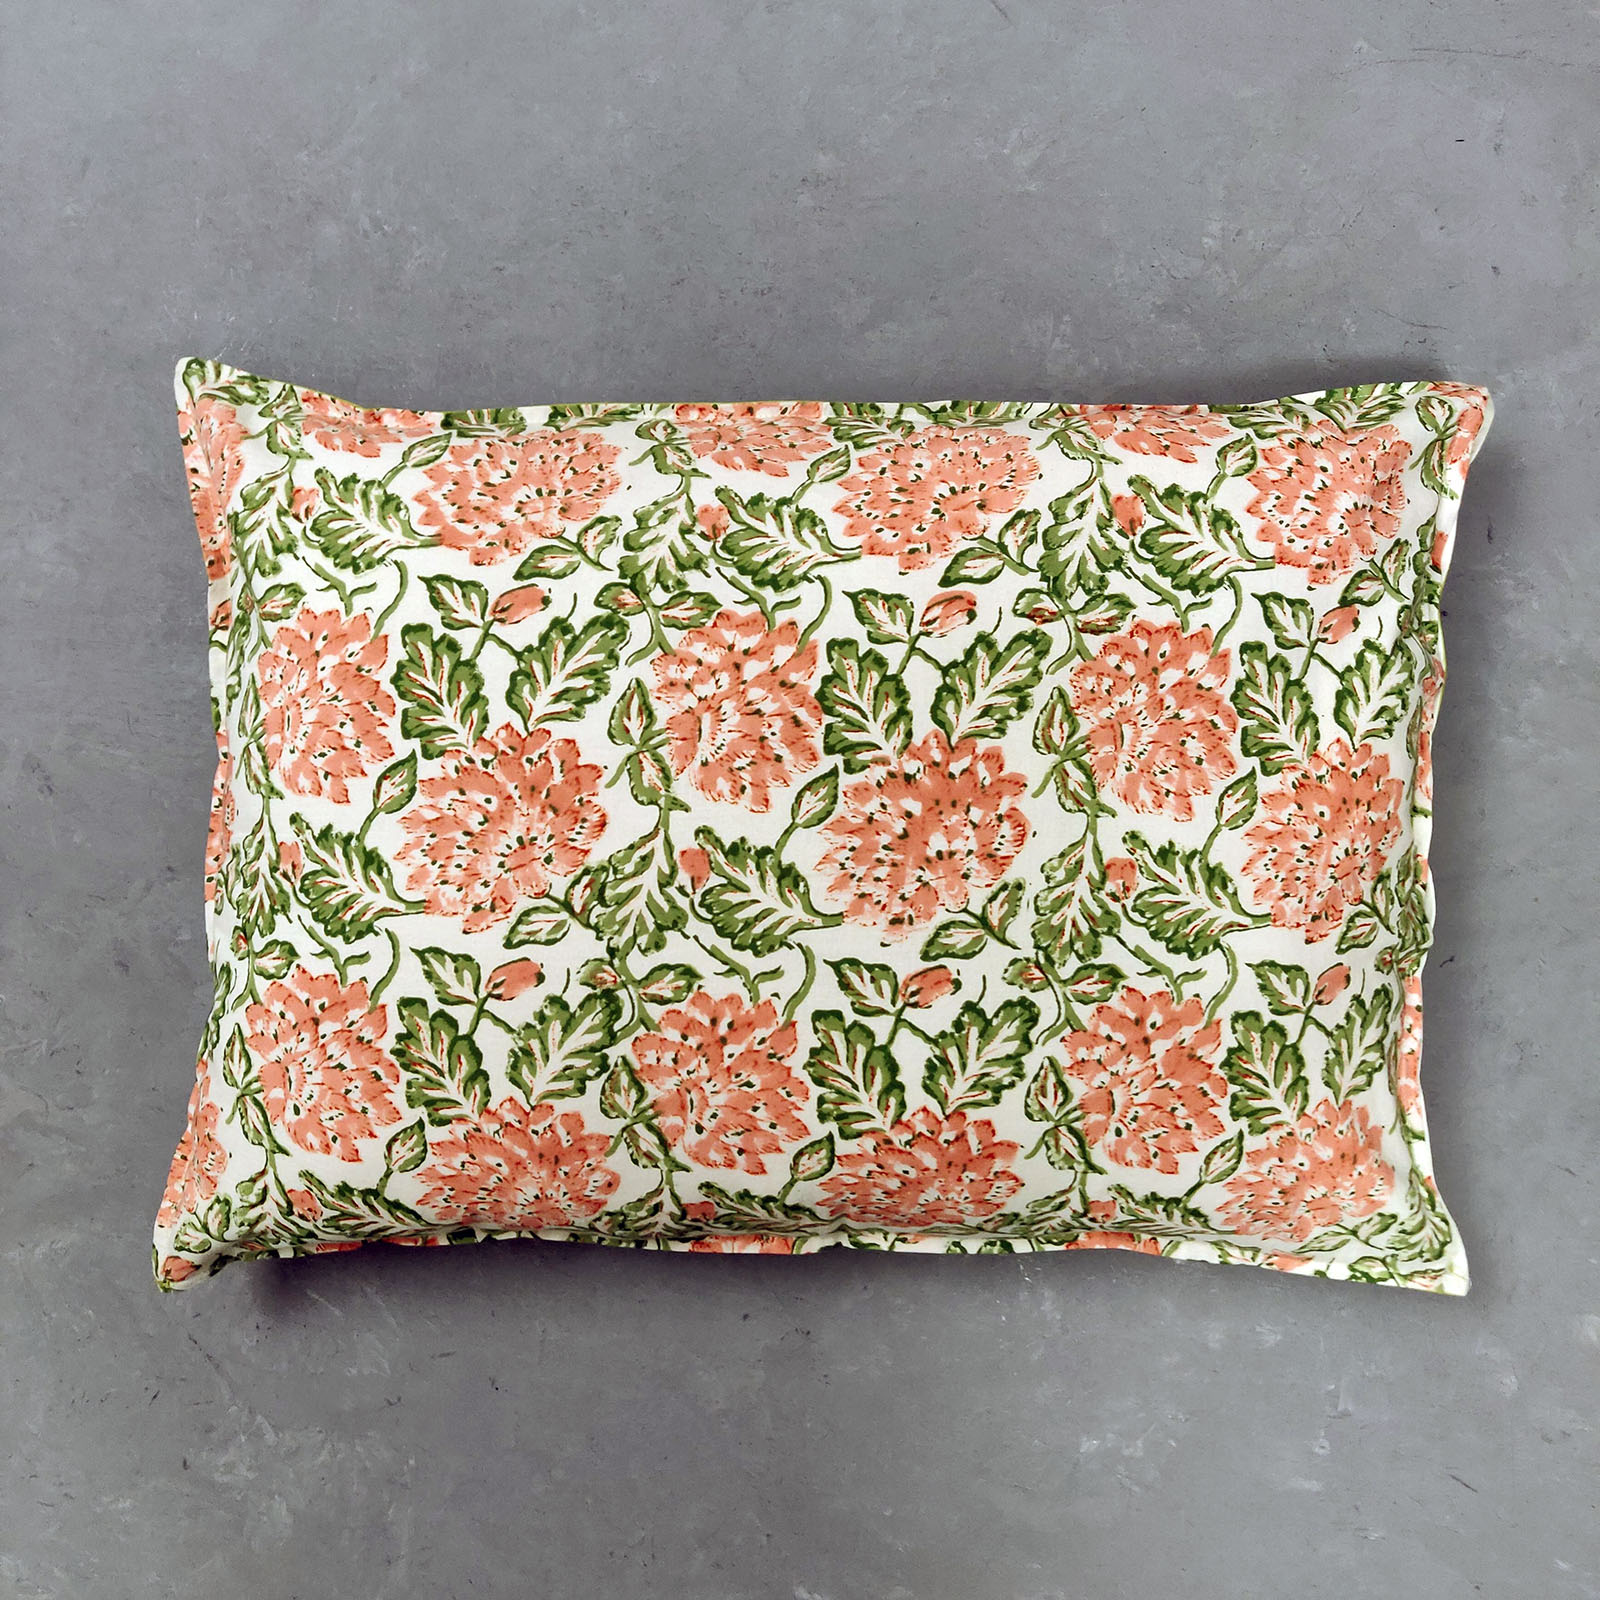 Hanyta Pillow Cover